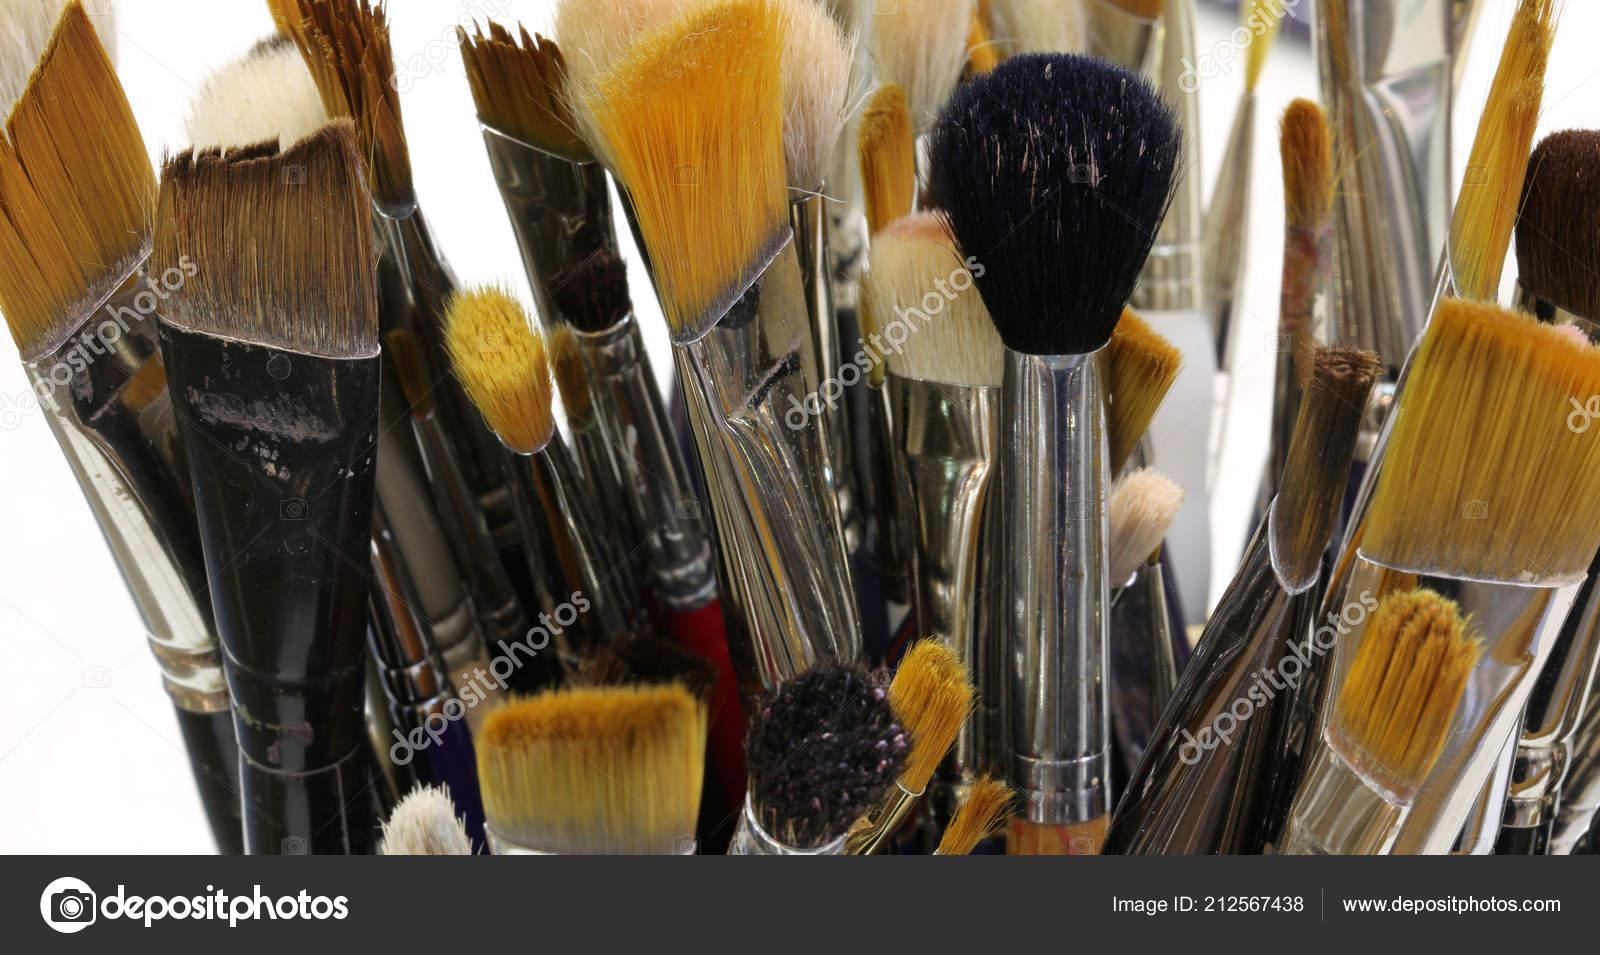 Many Ruined Brushes Sale Painter — Stock Photo © ChiccoDodiFC  212567438 f05bc56ae51c